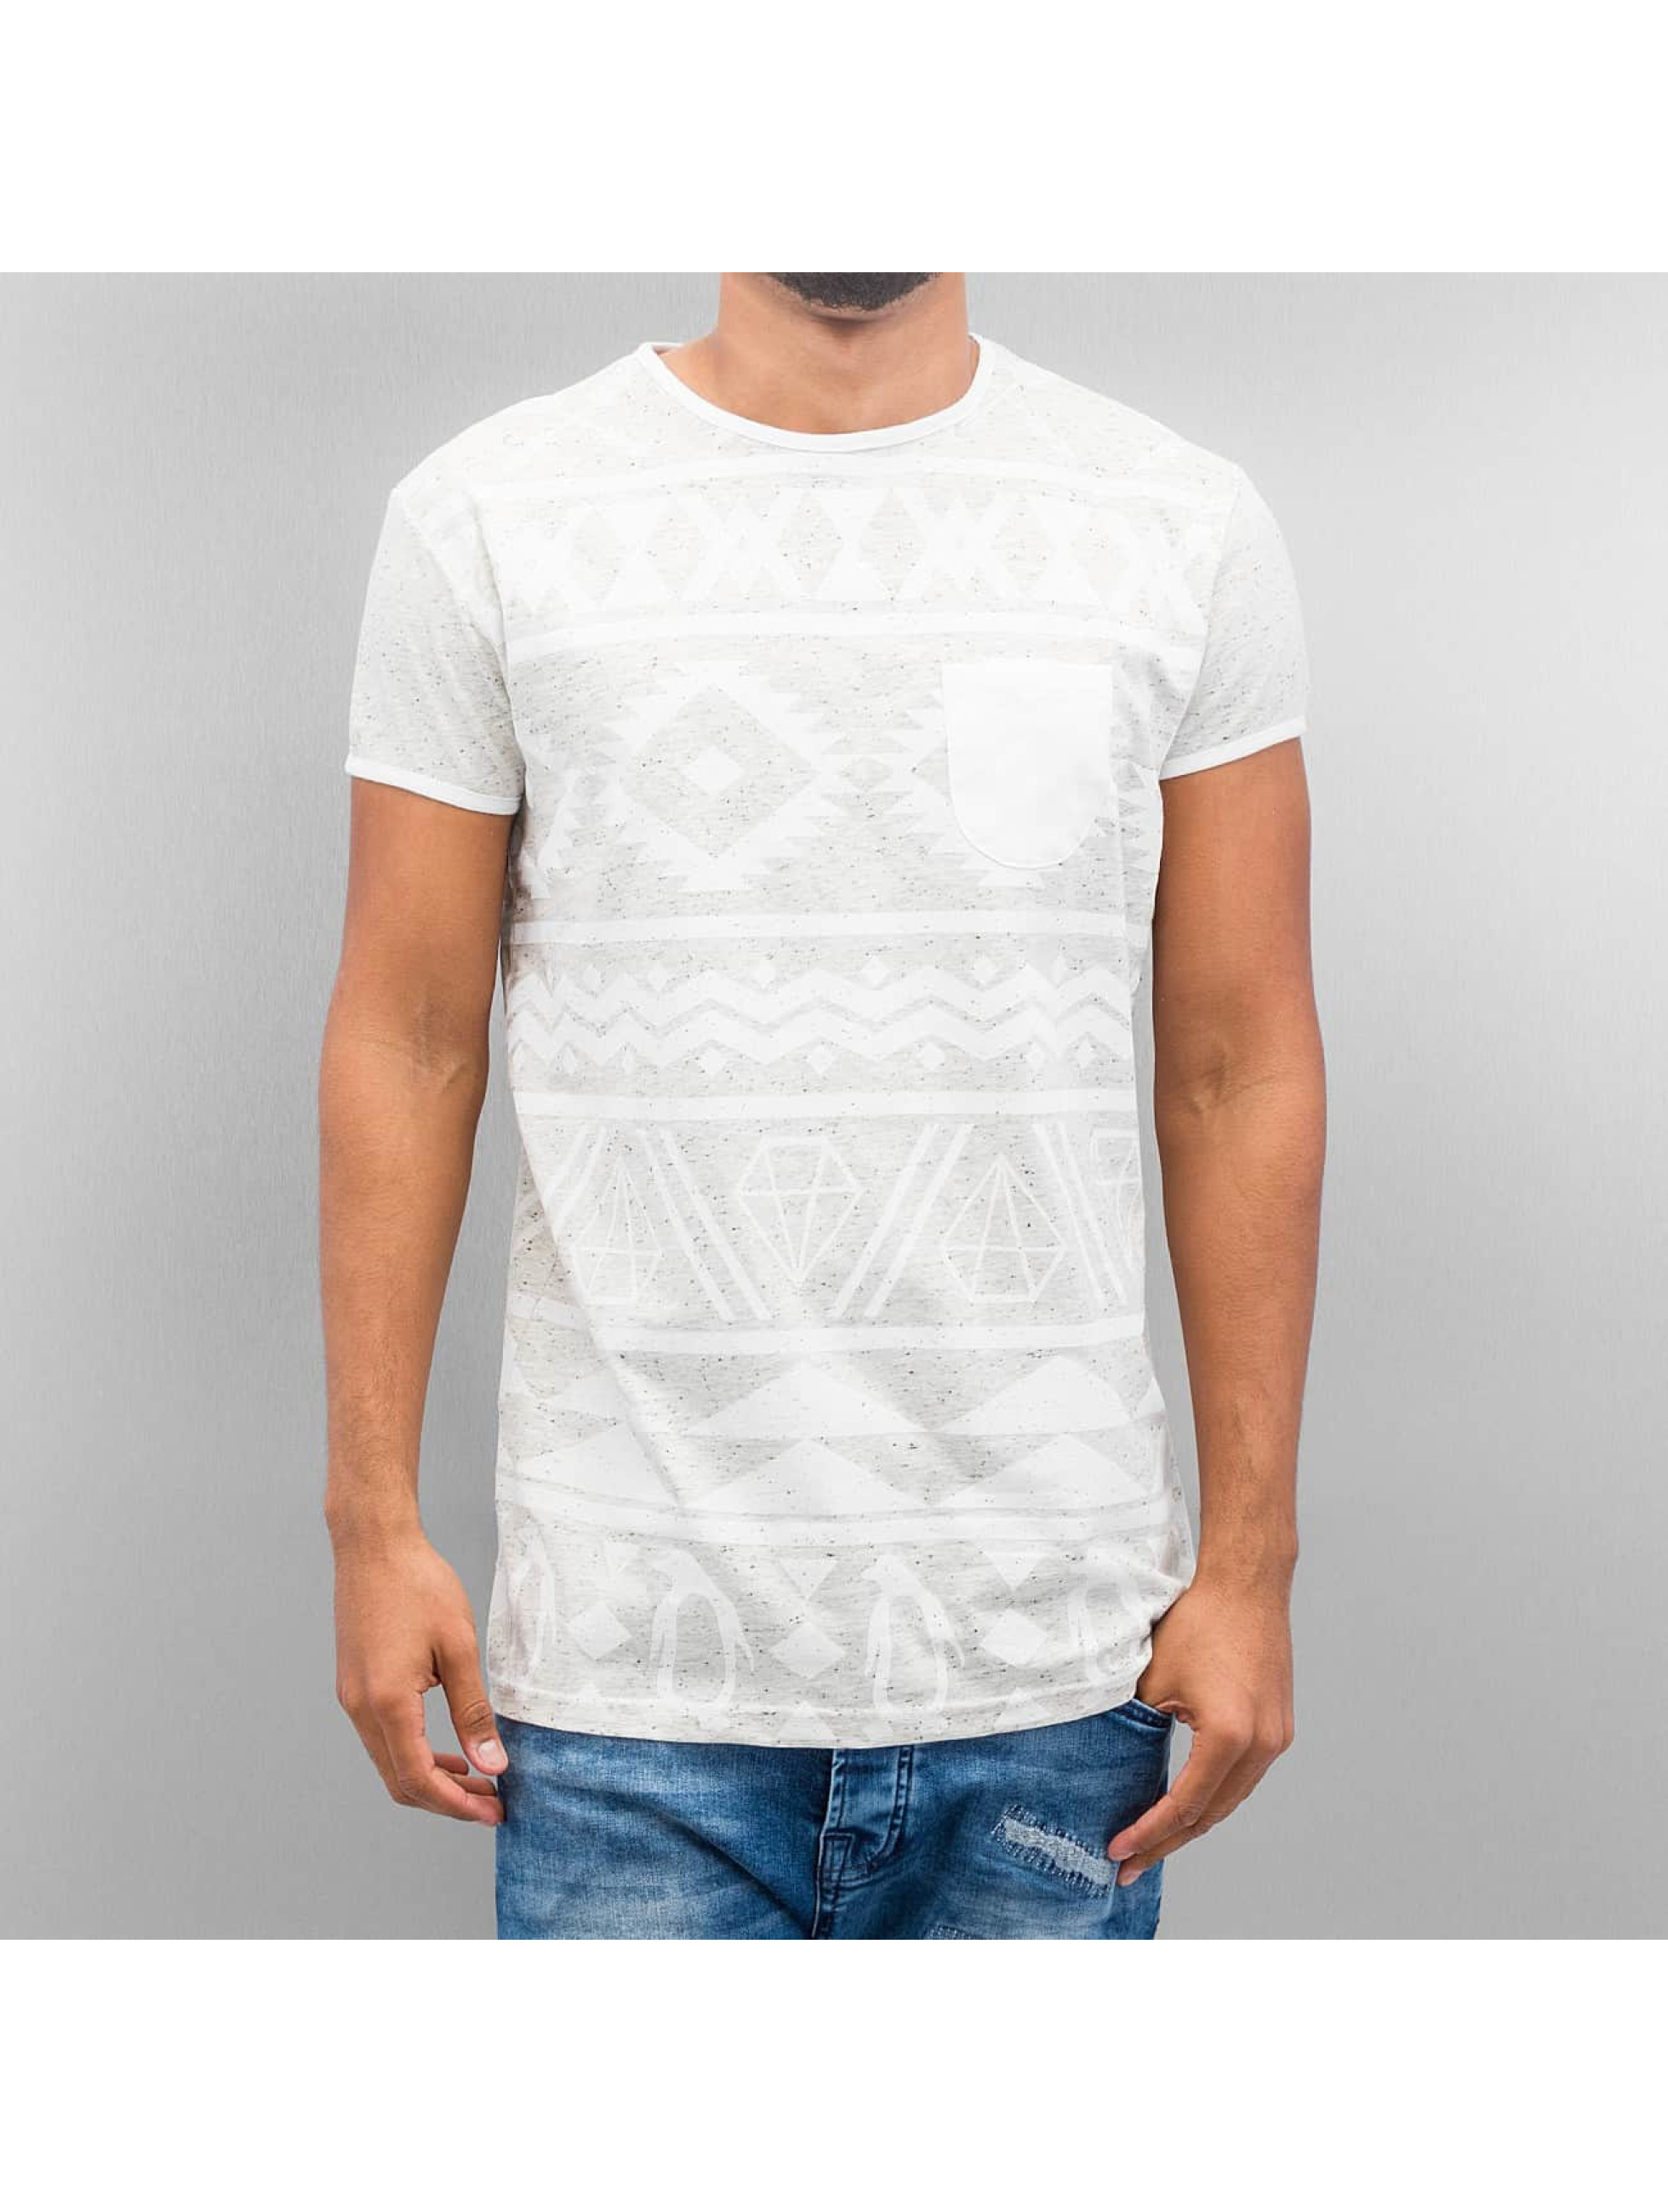 T-Shirt Penguin in weiß